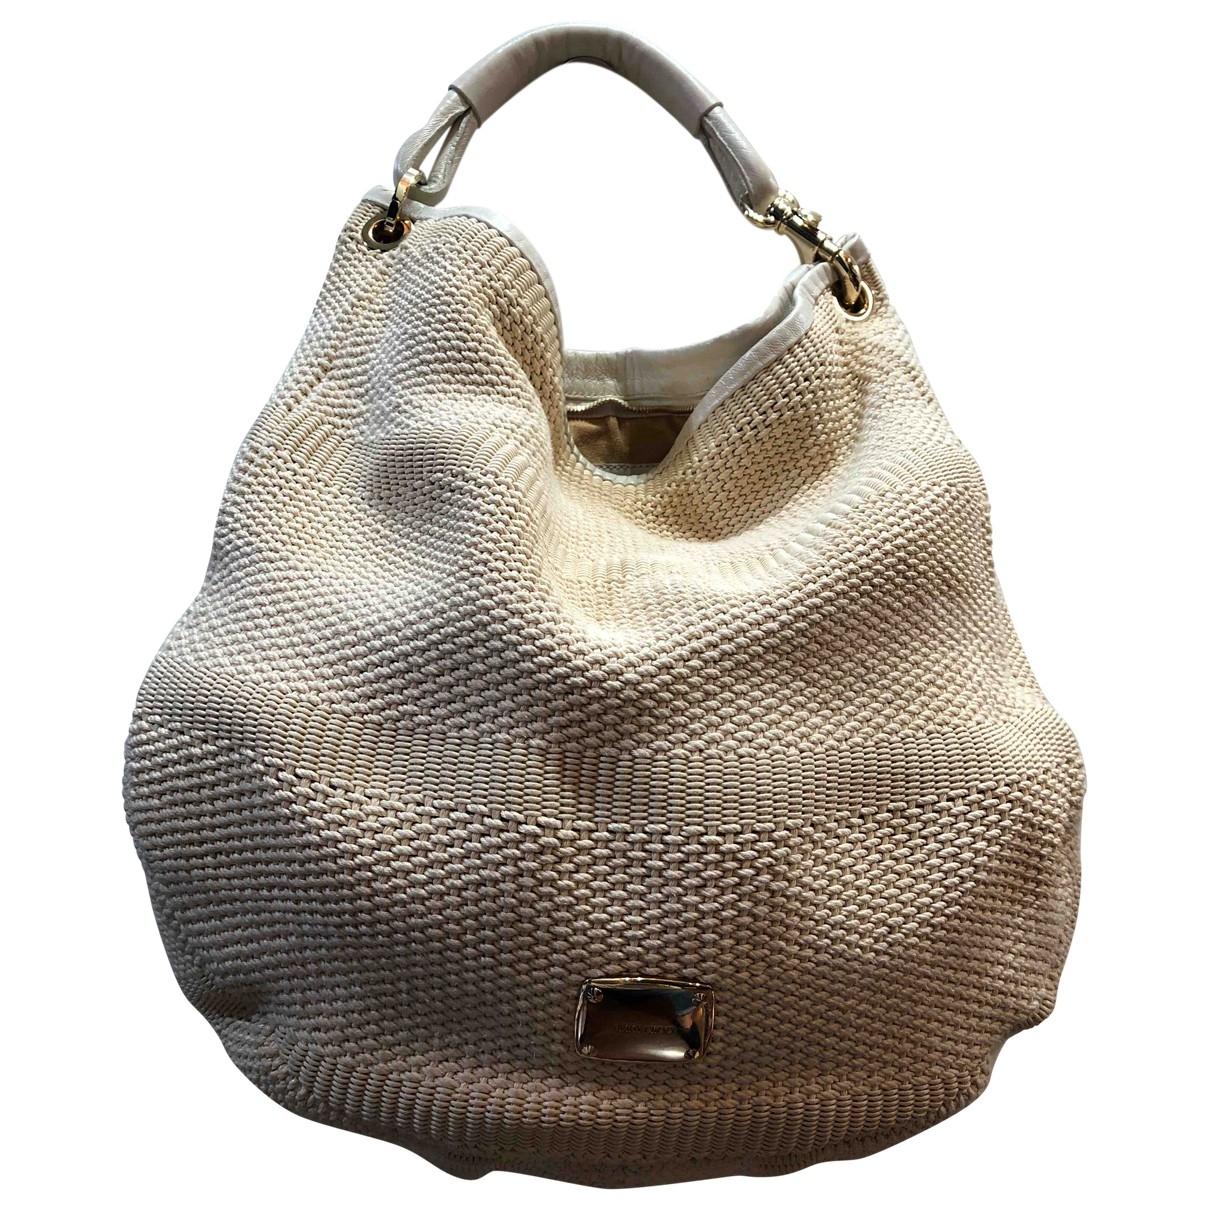 Jimmy Choo \N Beige Cotton handbag for Women \N